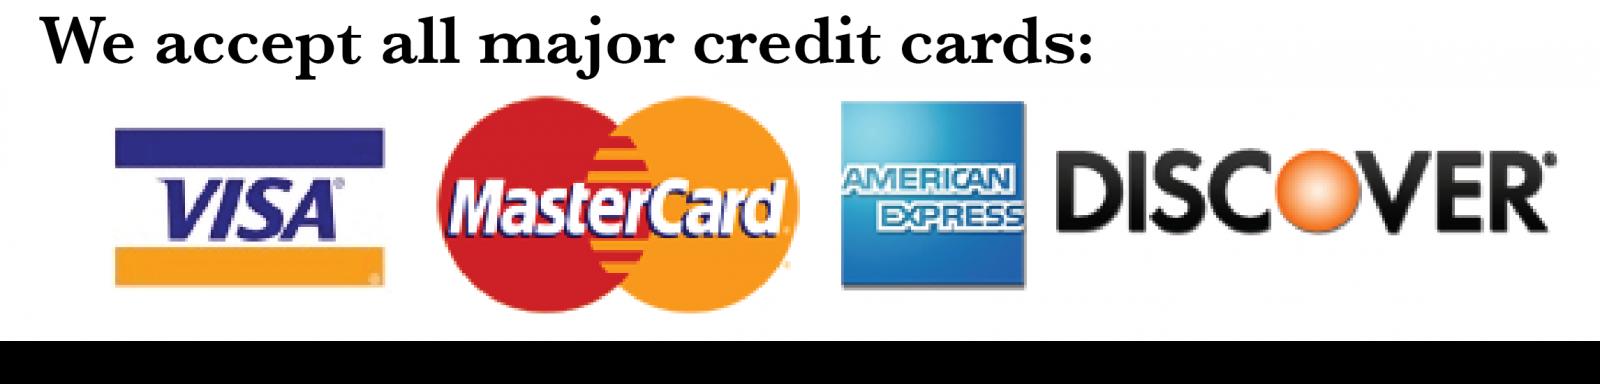 credit card mitc final